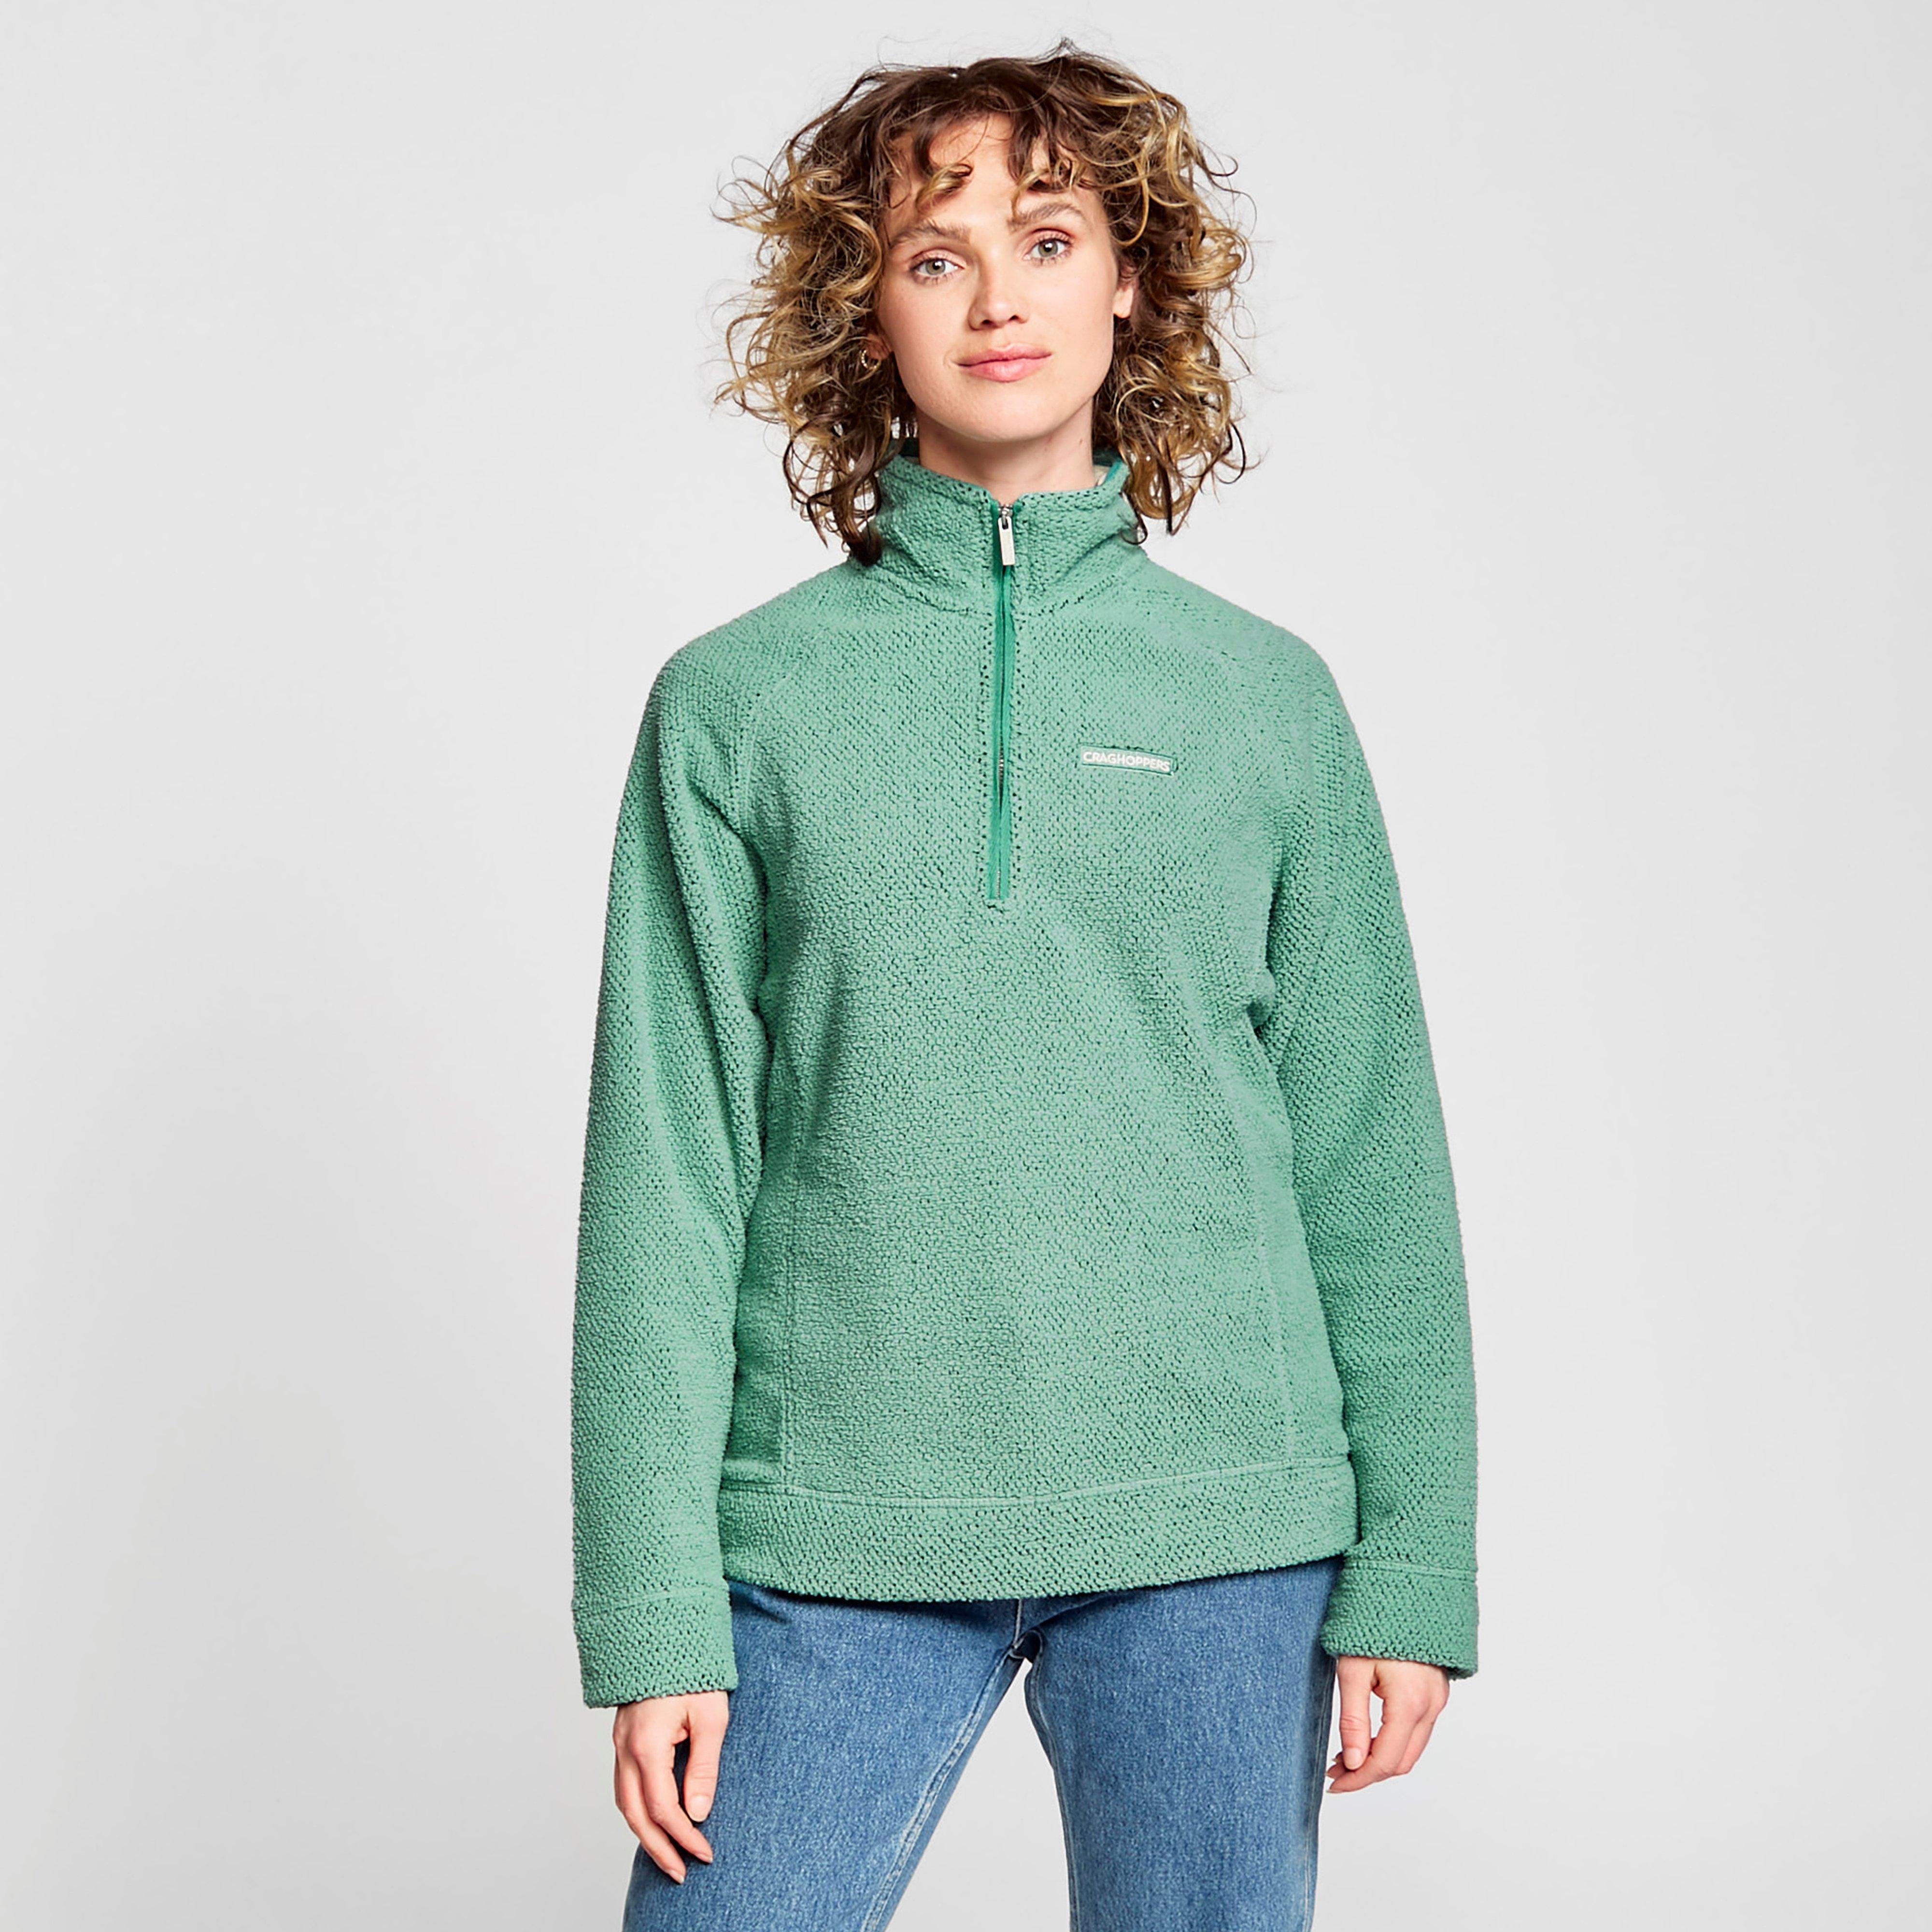 Craghoppers Women's Ambra Half-Zip Fleece - Green/Lgn, Green